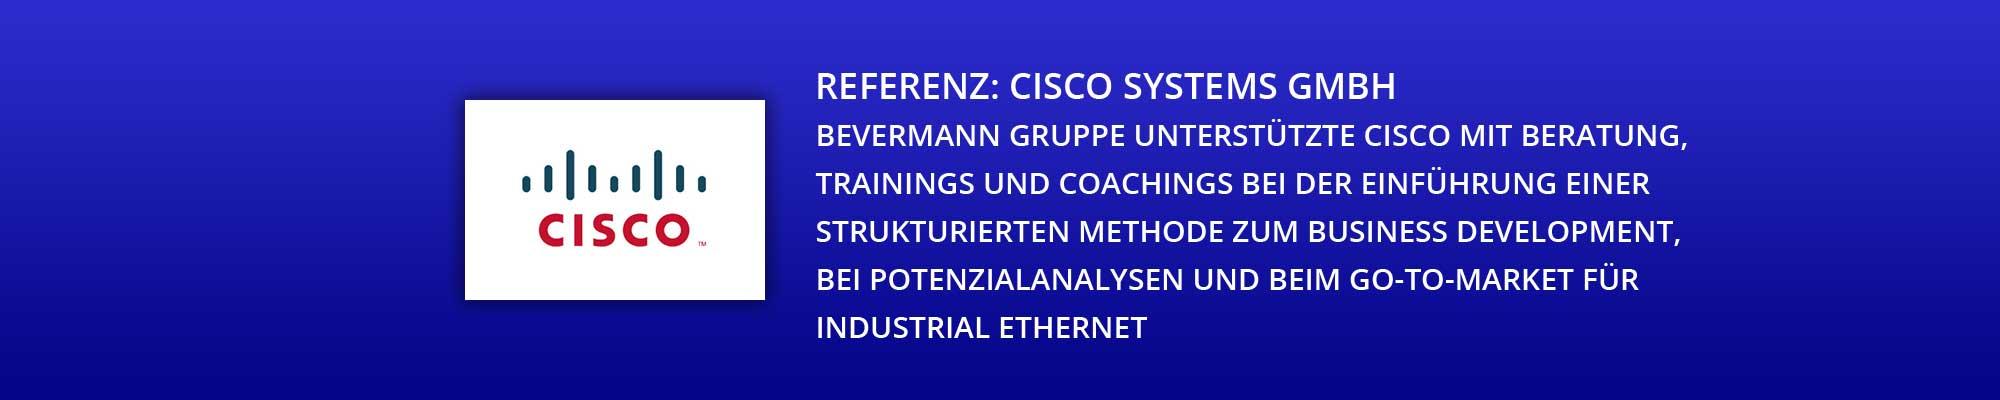 Cisco-Systems-GmbH